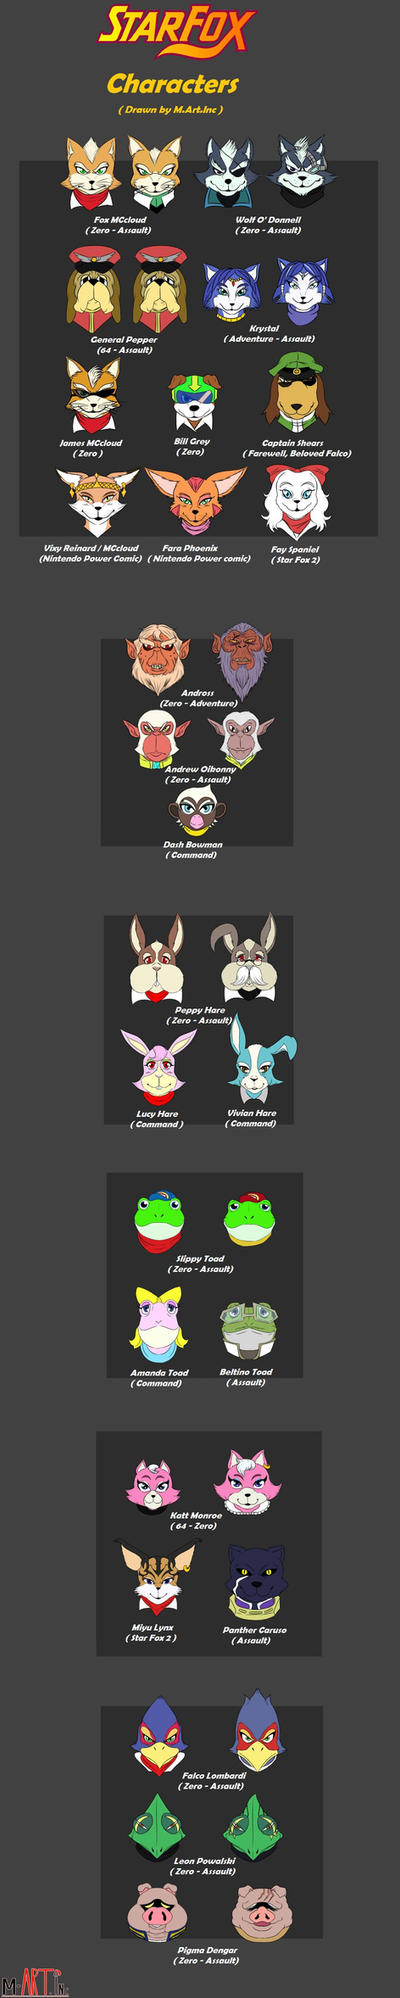 Star Fox Characters headshot by MArt1nc